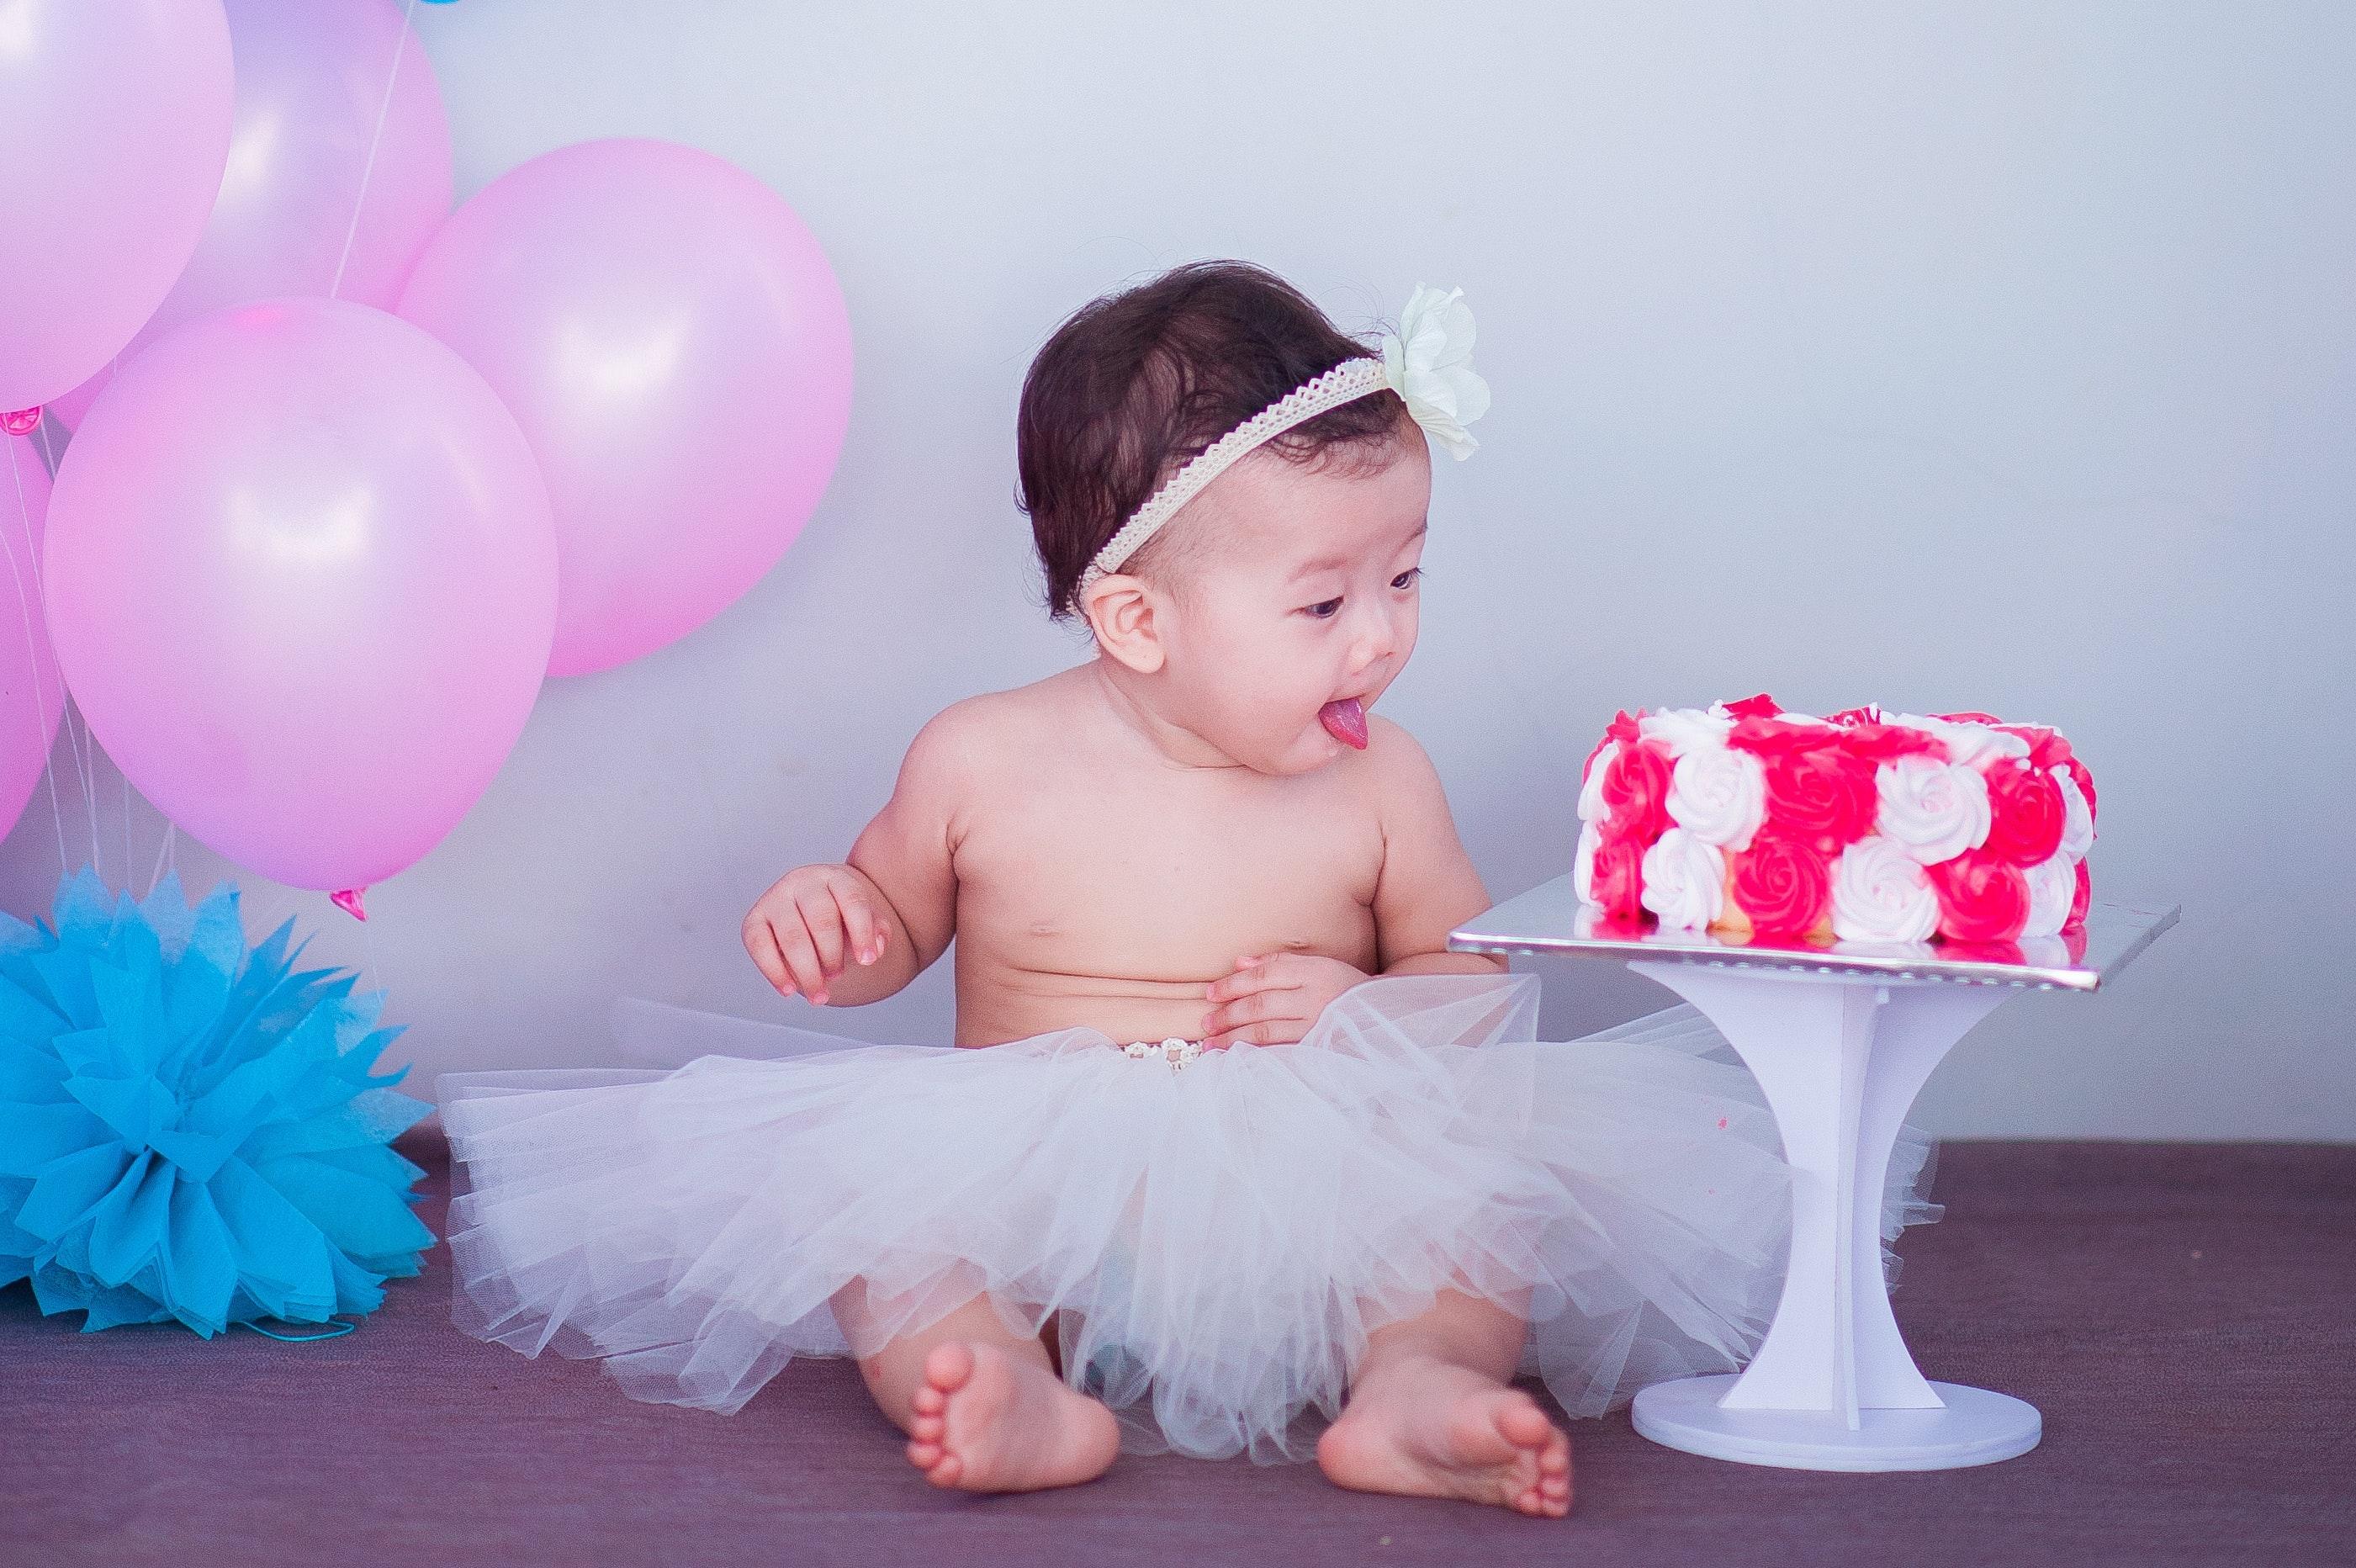 Baby in white tutu skirt beside cake photo